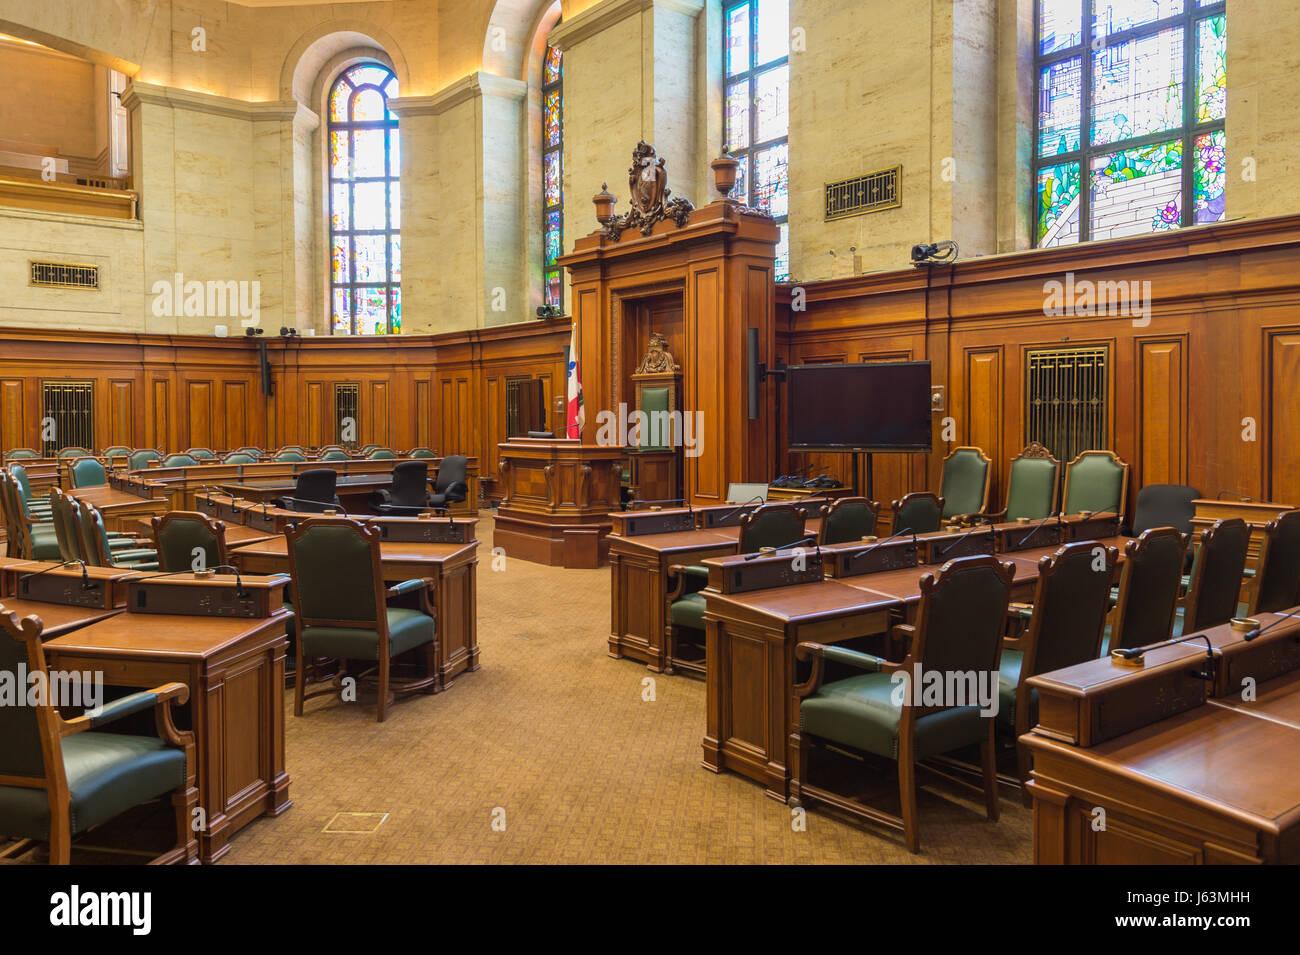 Montreal city hall council chamber - Stock Image